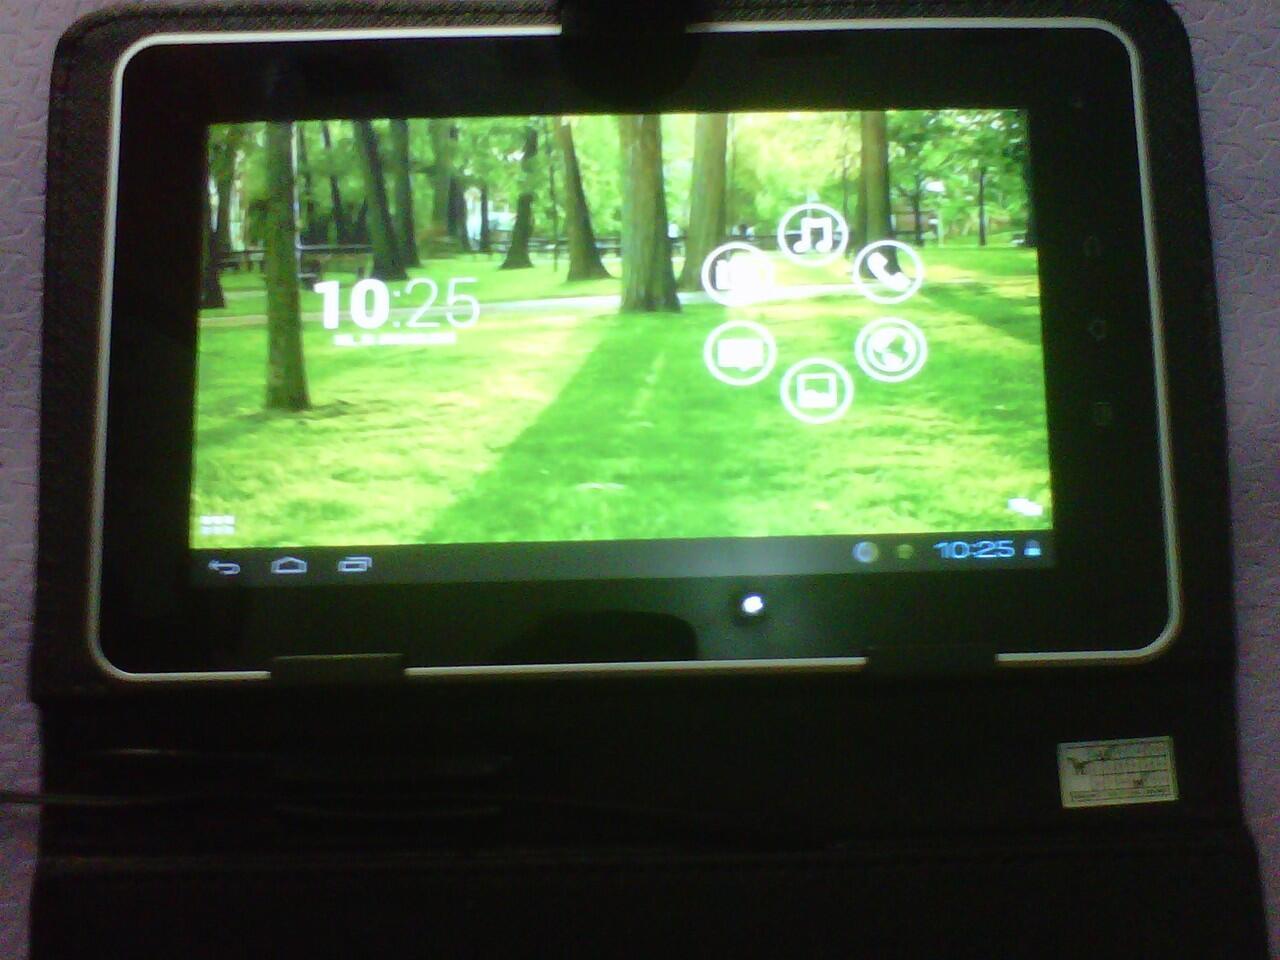 WTS Tablet Cyrus Pad i 8 Gb Spect Gaming under 800k bandung